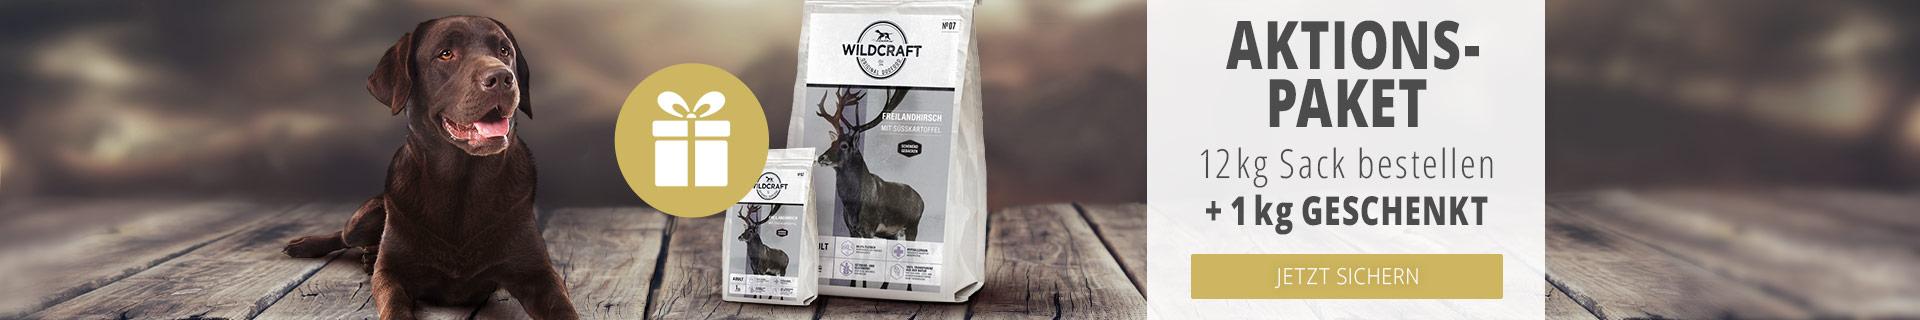 Wildcraft Trockenfutter Aktion - 1kg geschenkt